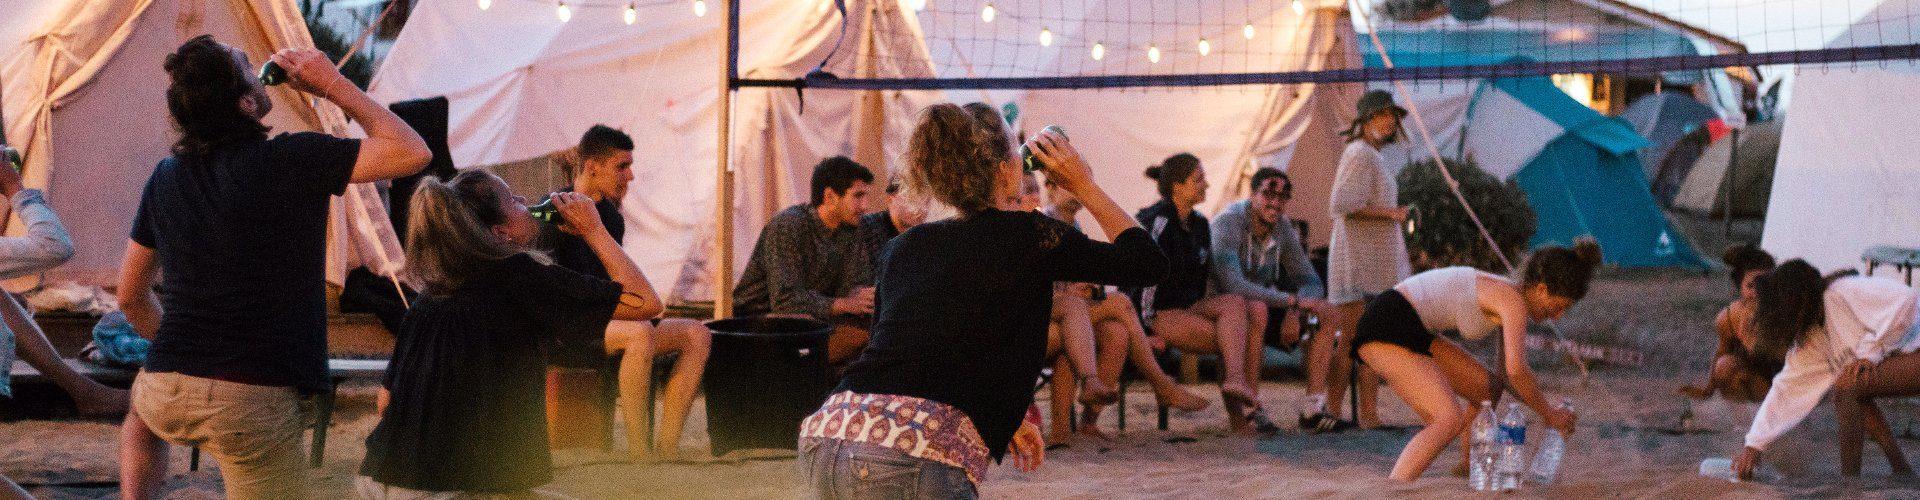 Vieux Boucau Komfortable glamping Zelte bei Nacht